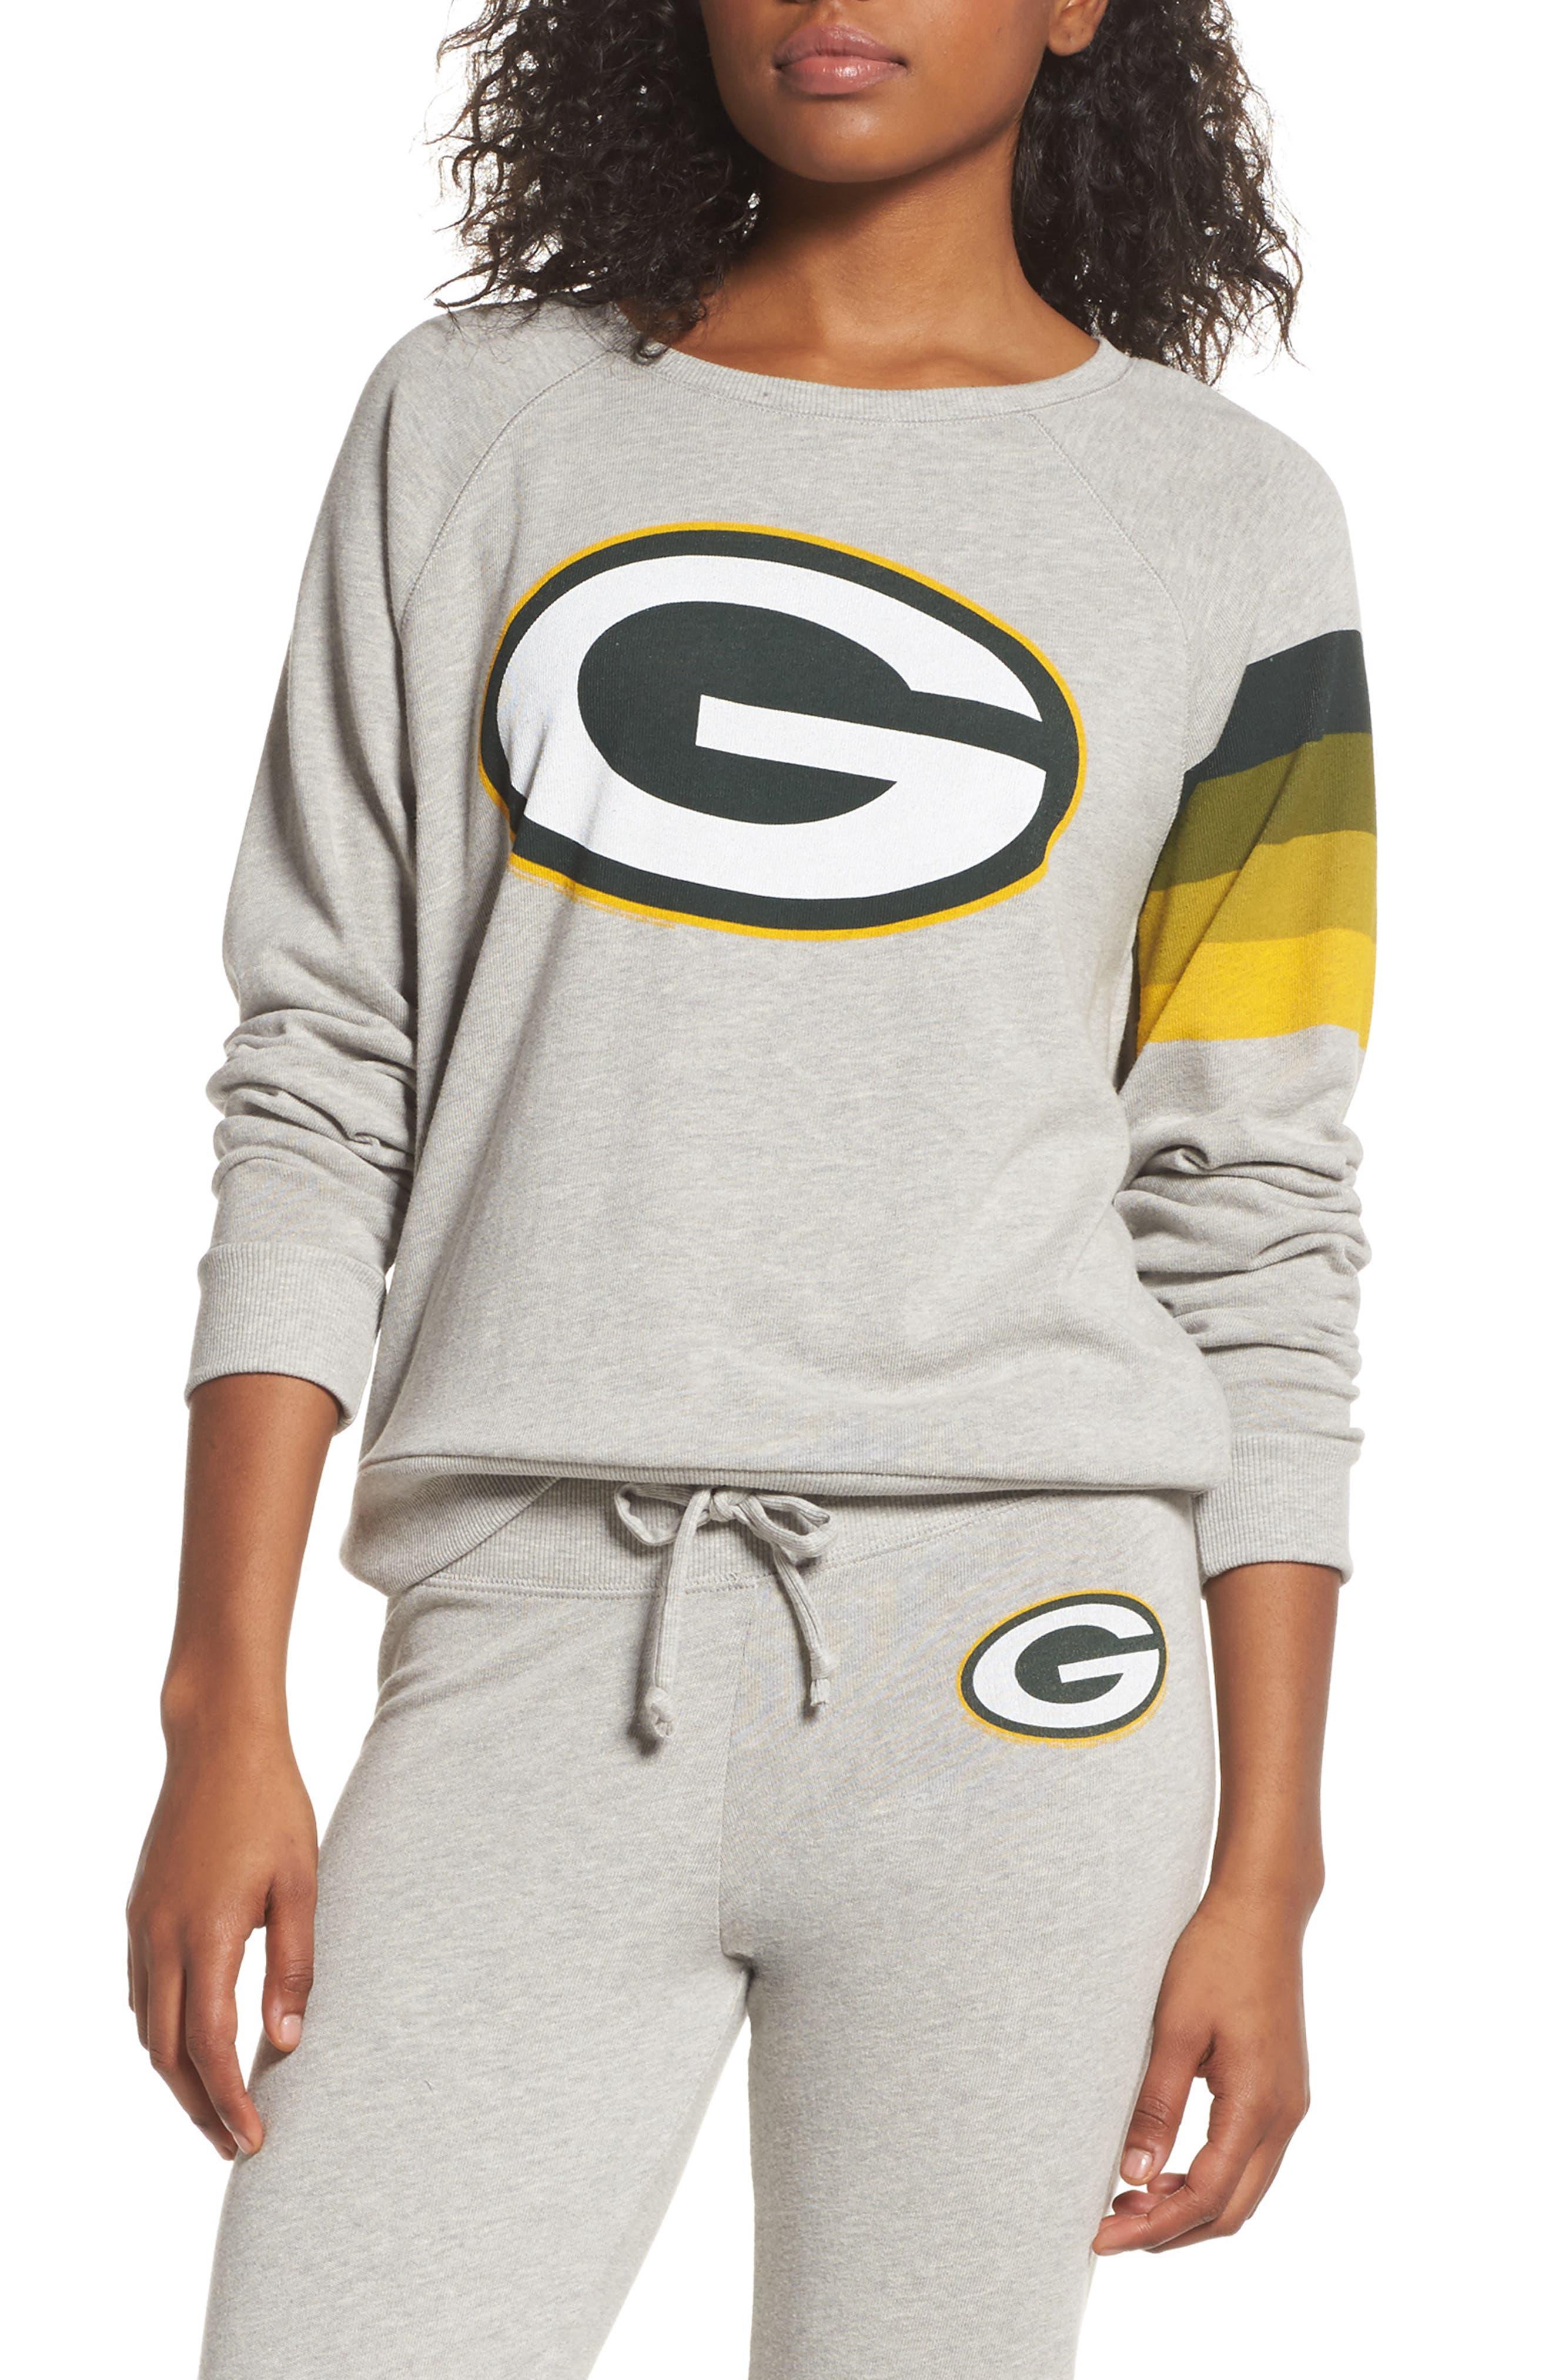 NF Green Bay Packers Hacci Sweatshirt,                             Main thumbnail 1, color,                             Dove Heather Grey